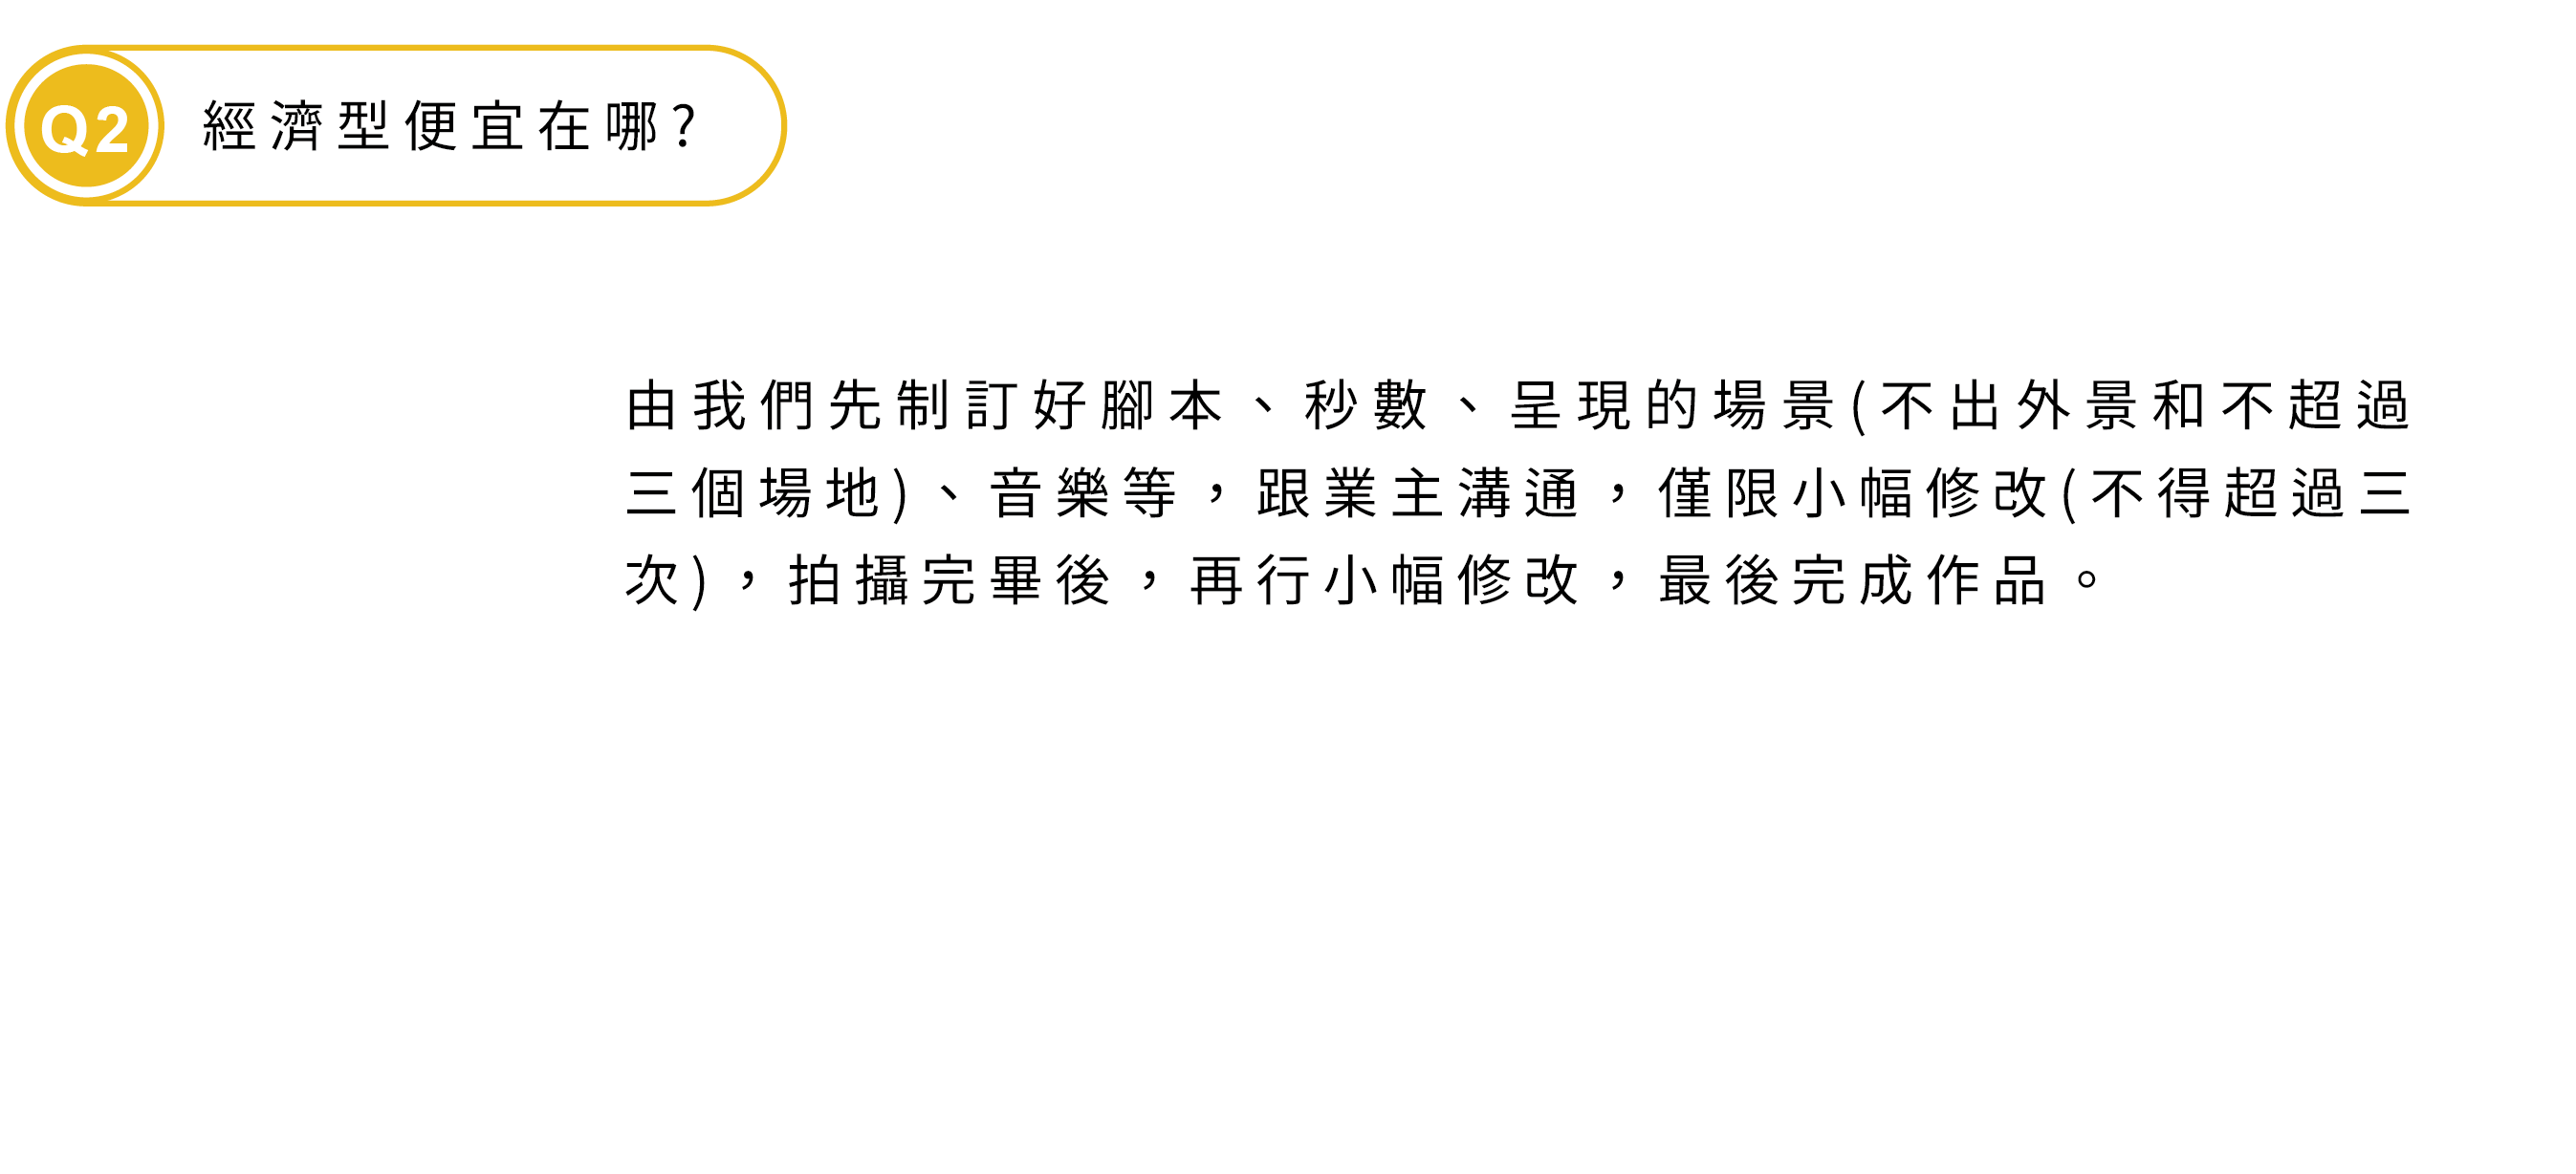 Q2-12